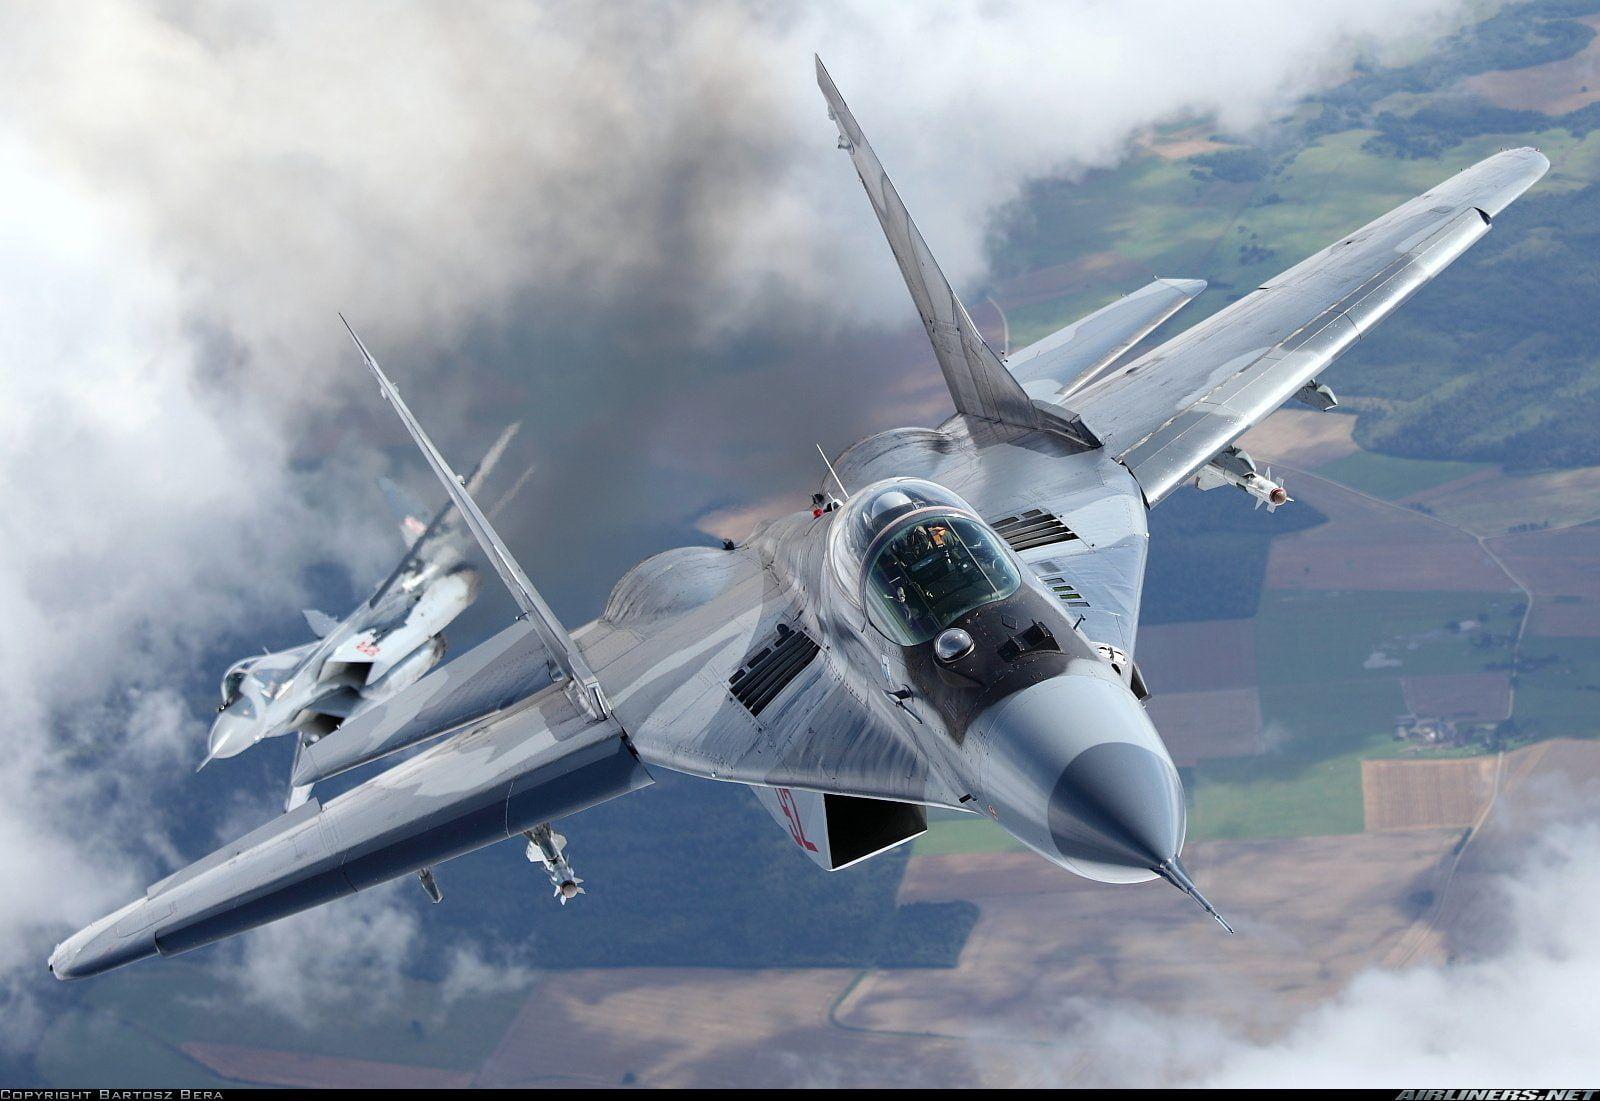 Aircraft Fighter Jet Mig Mig 29 Military Russia Soviet 720p Wallpaper Hdwallpaper Desktop Aircraft Fighter Fighter Jets Good aircrafts military hd wallpaper